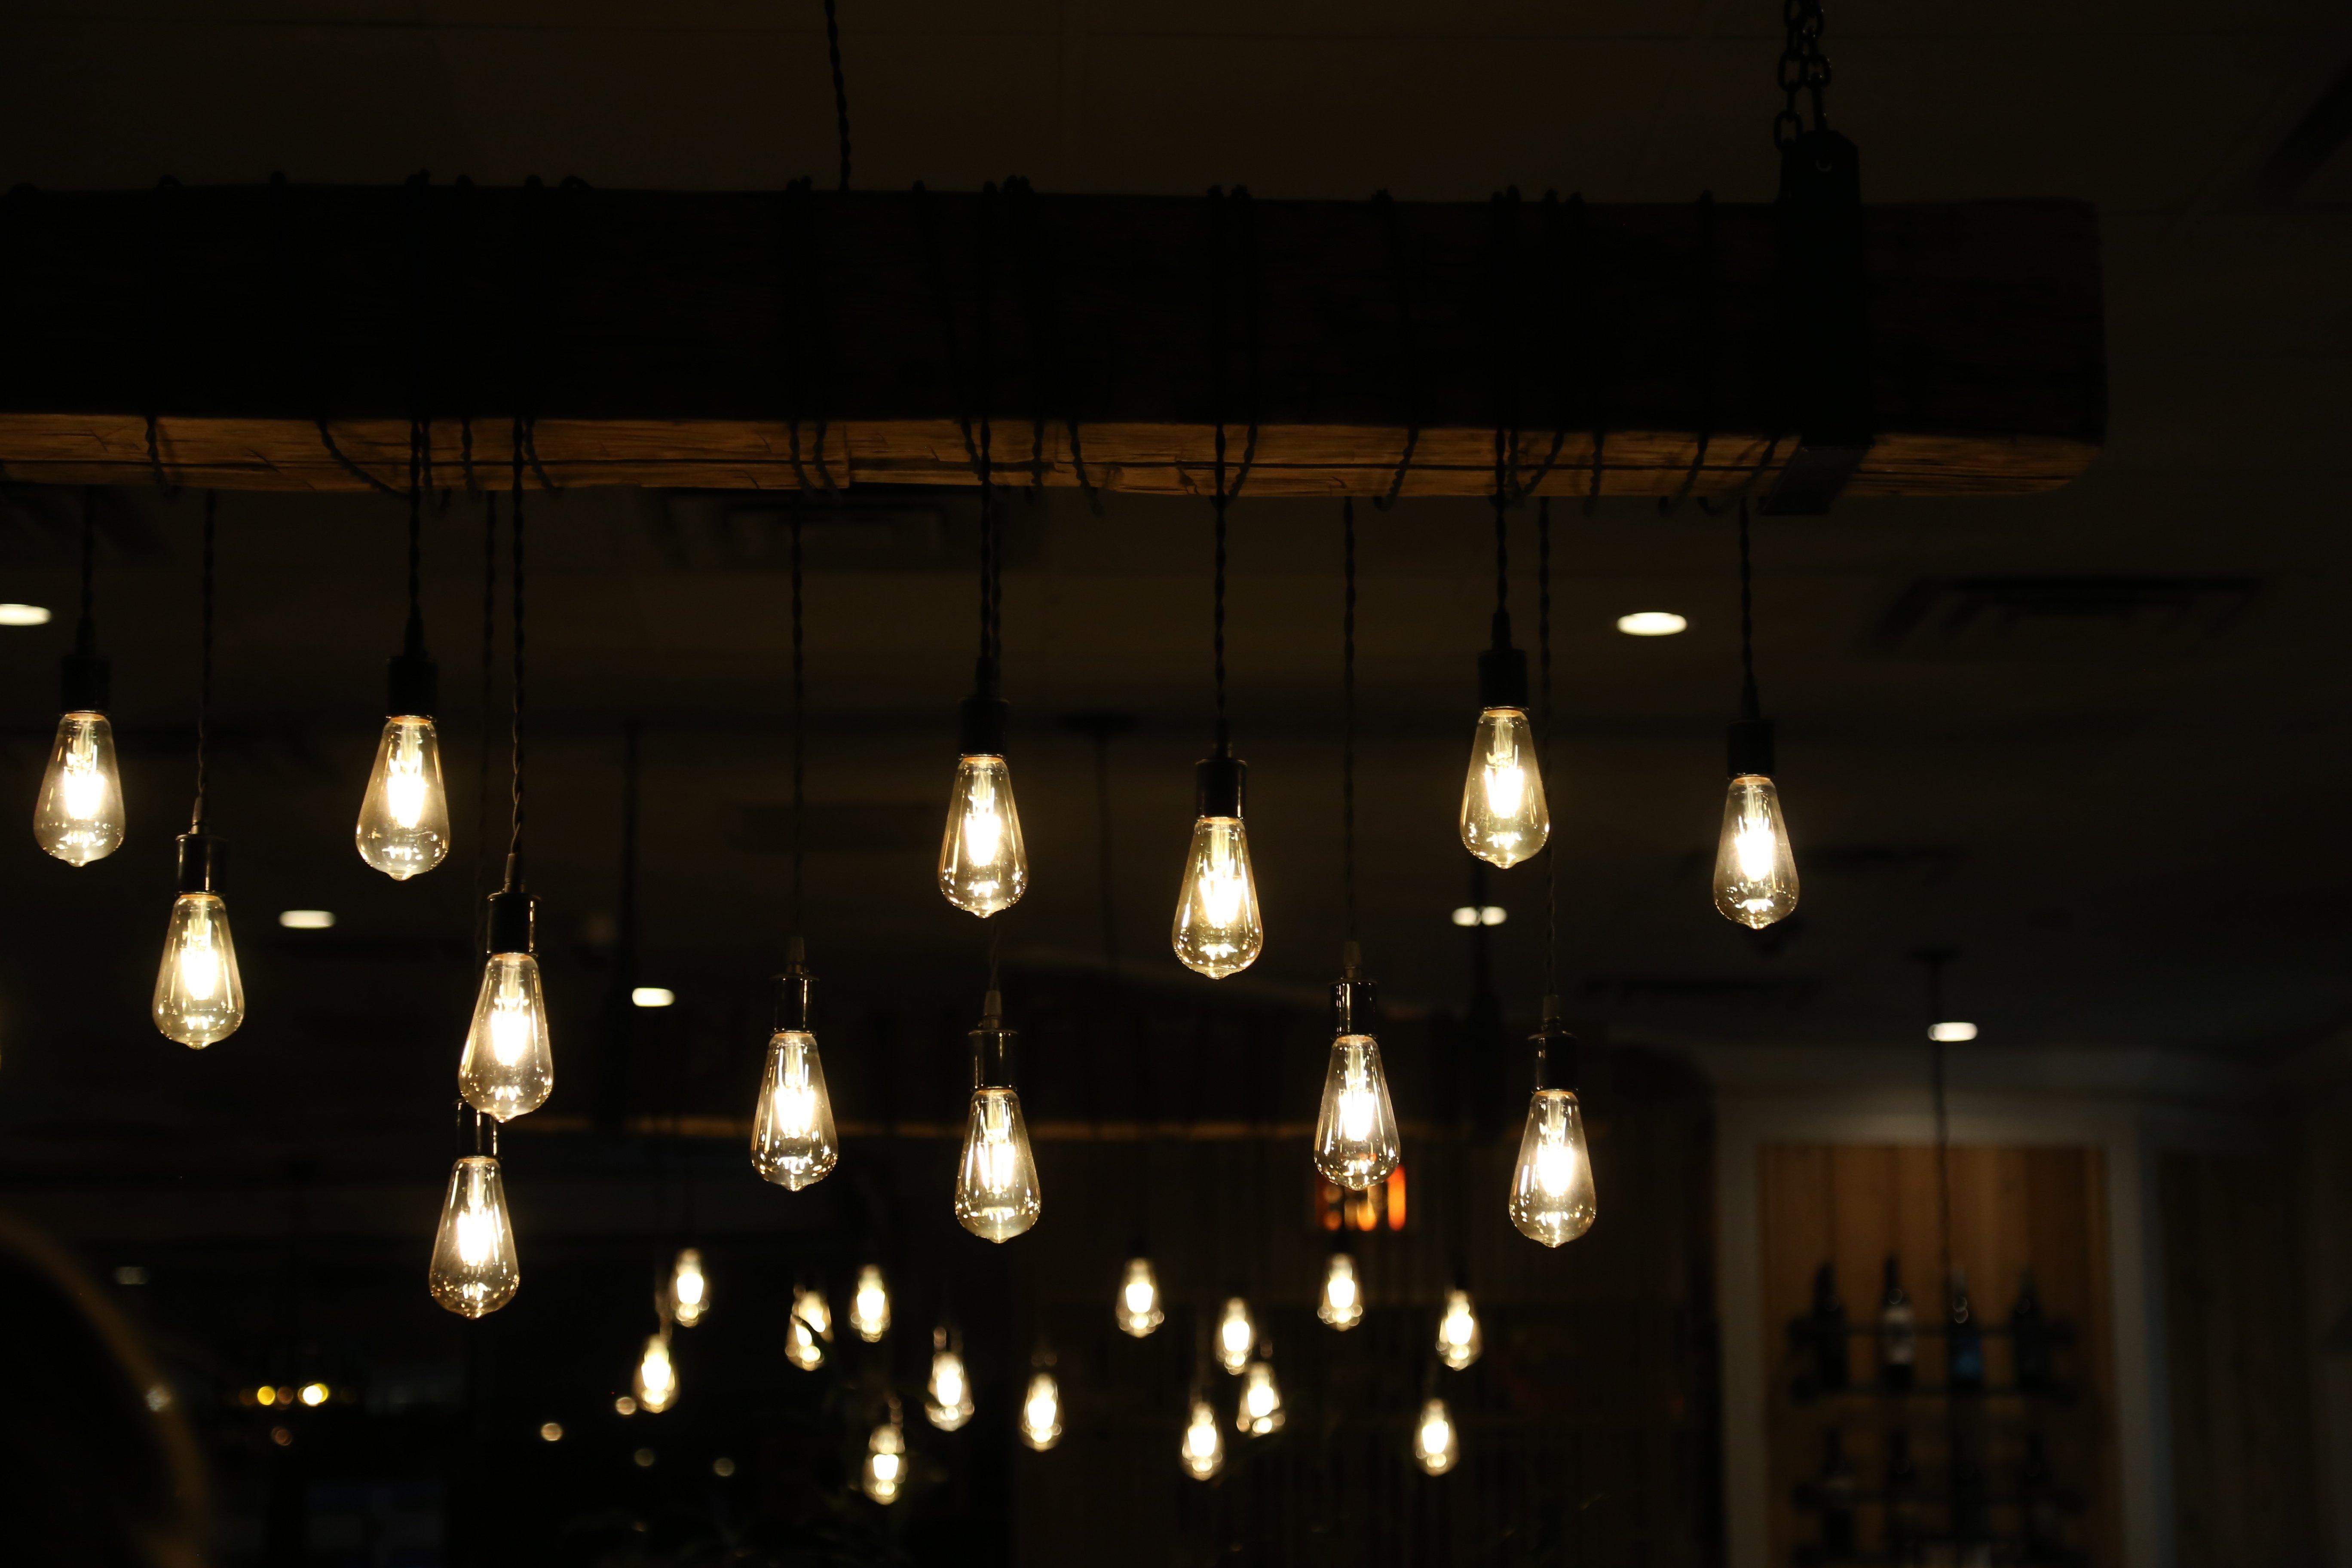 Edison Lighting Electrician for Crofton MD